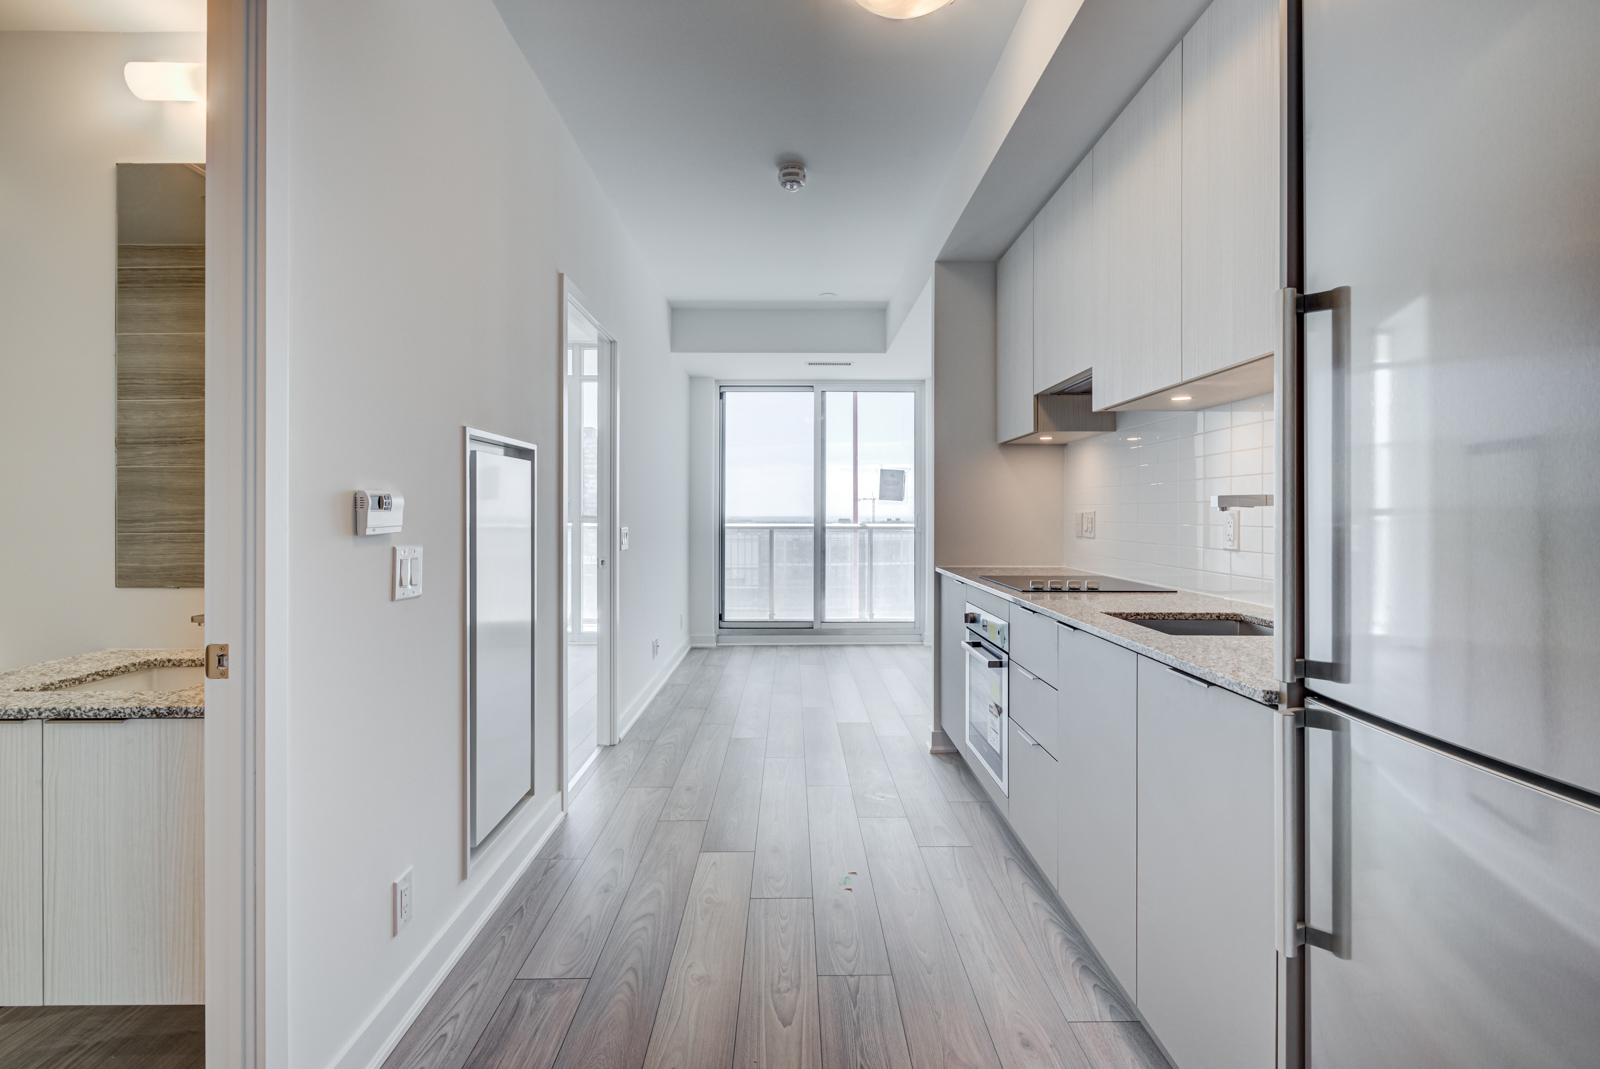 Condo with laminate floors and light gray walls.